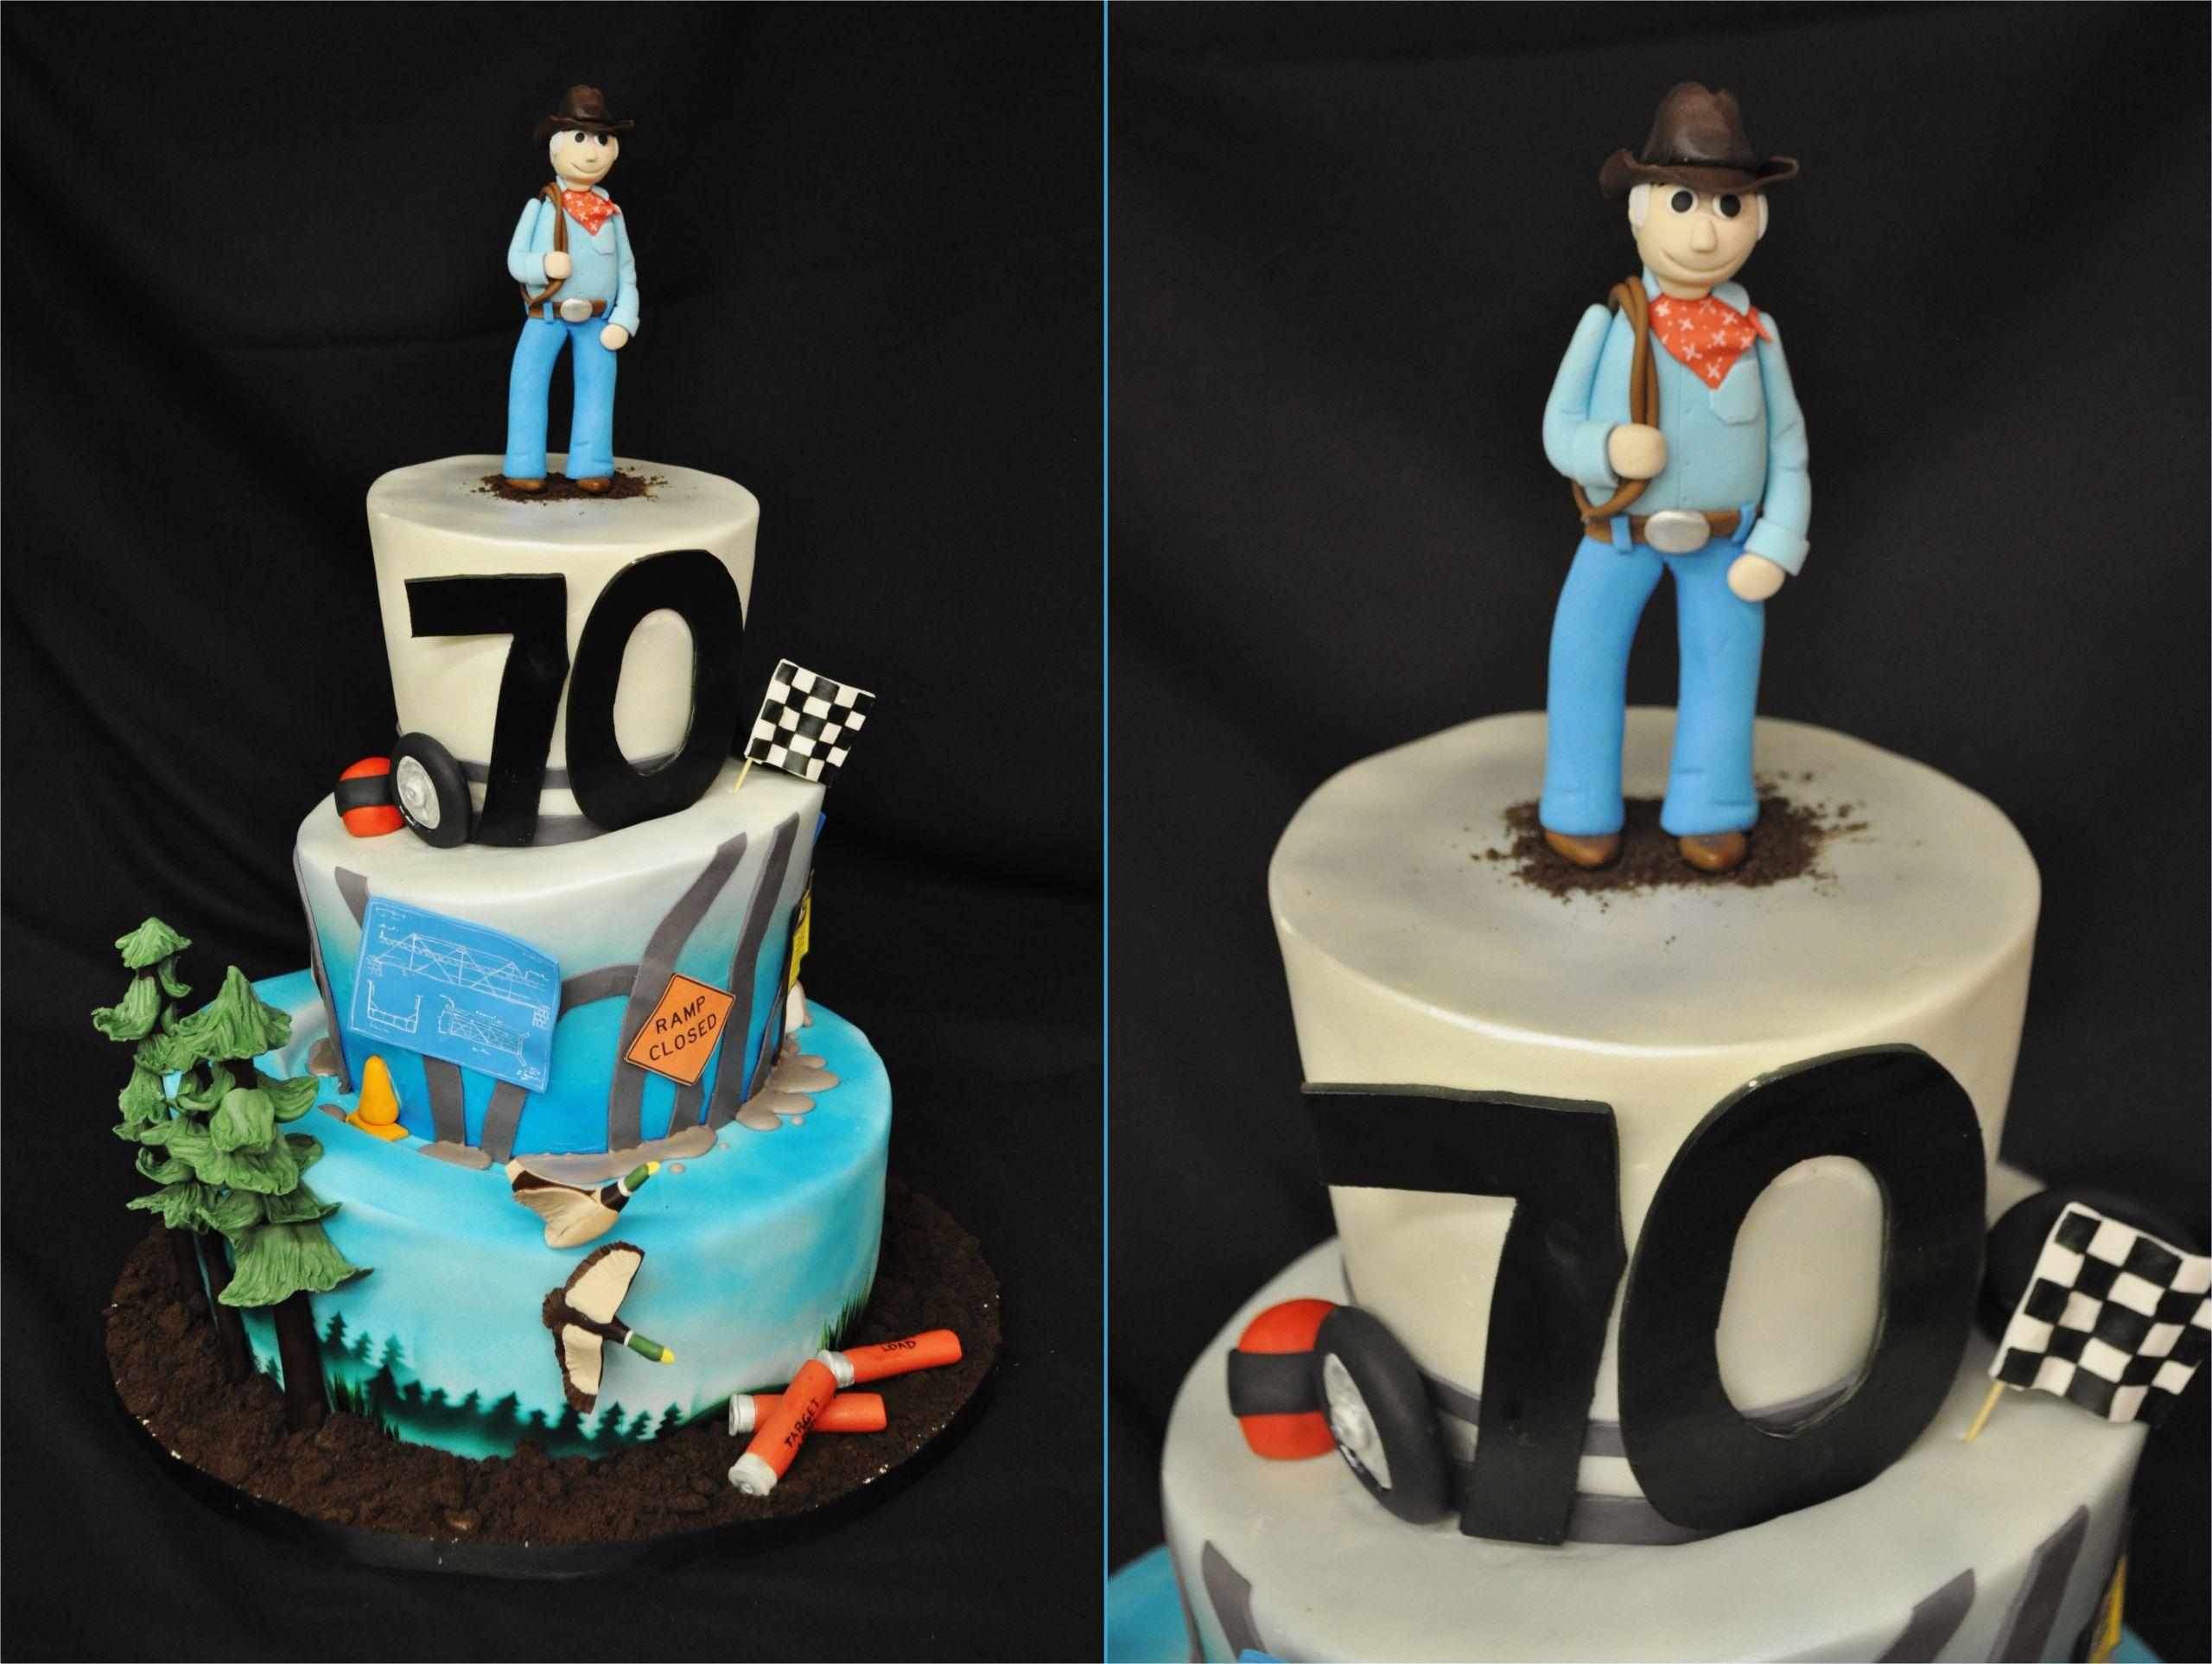 milestone 70th birthday cake